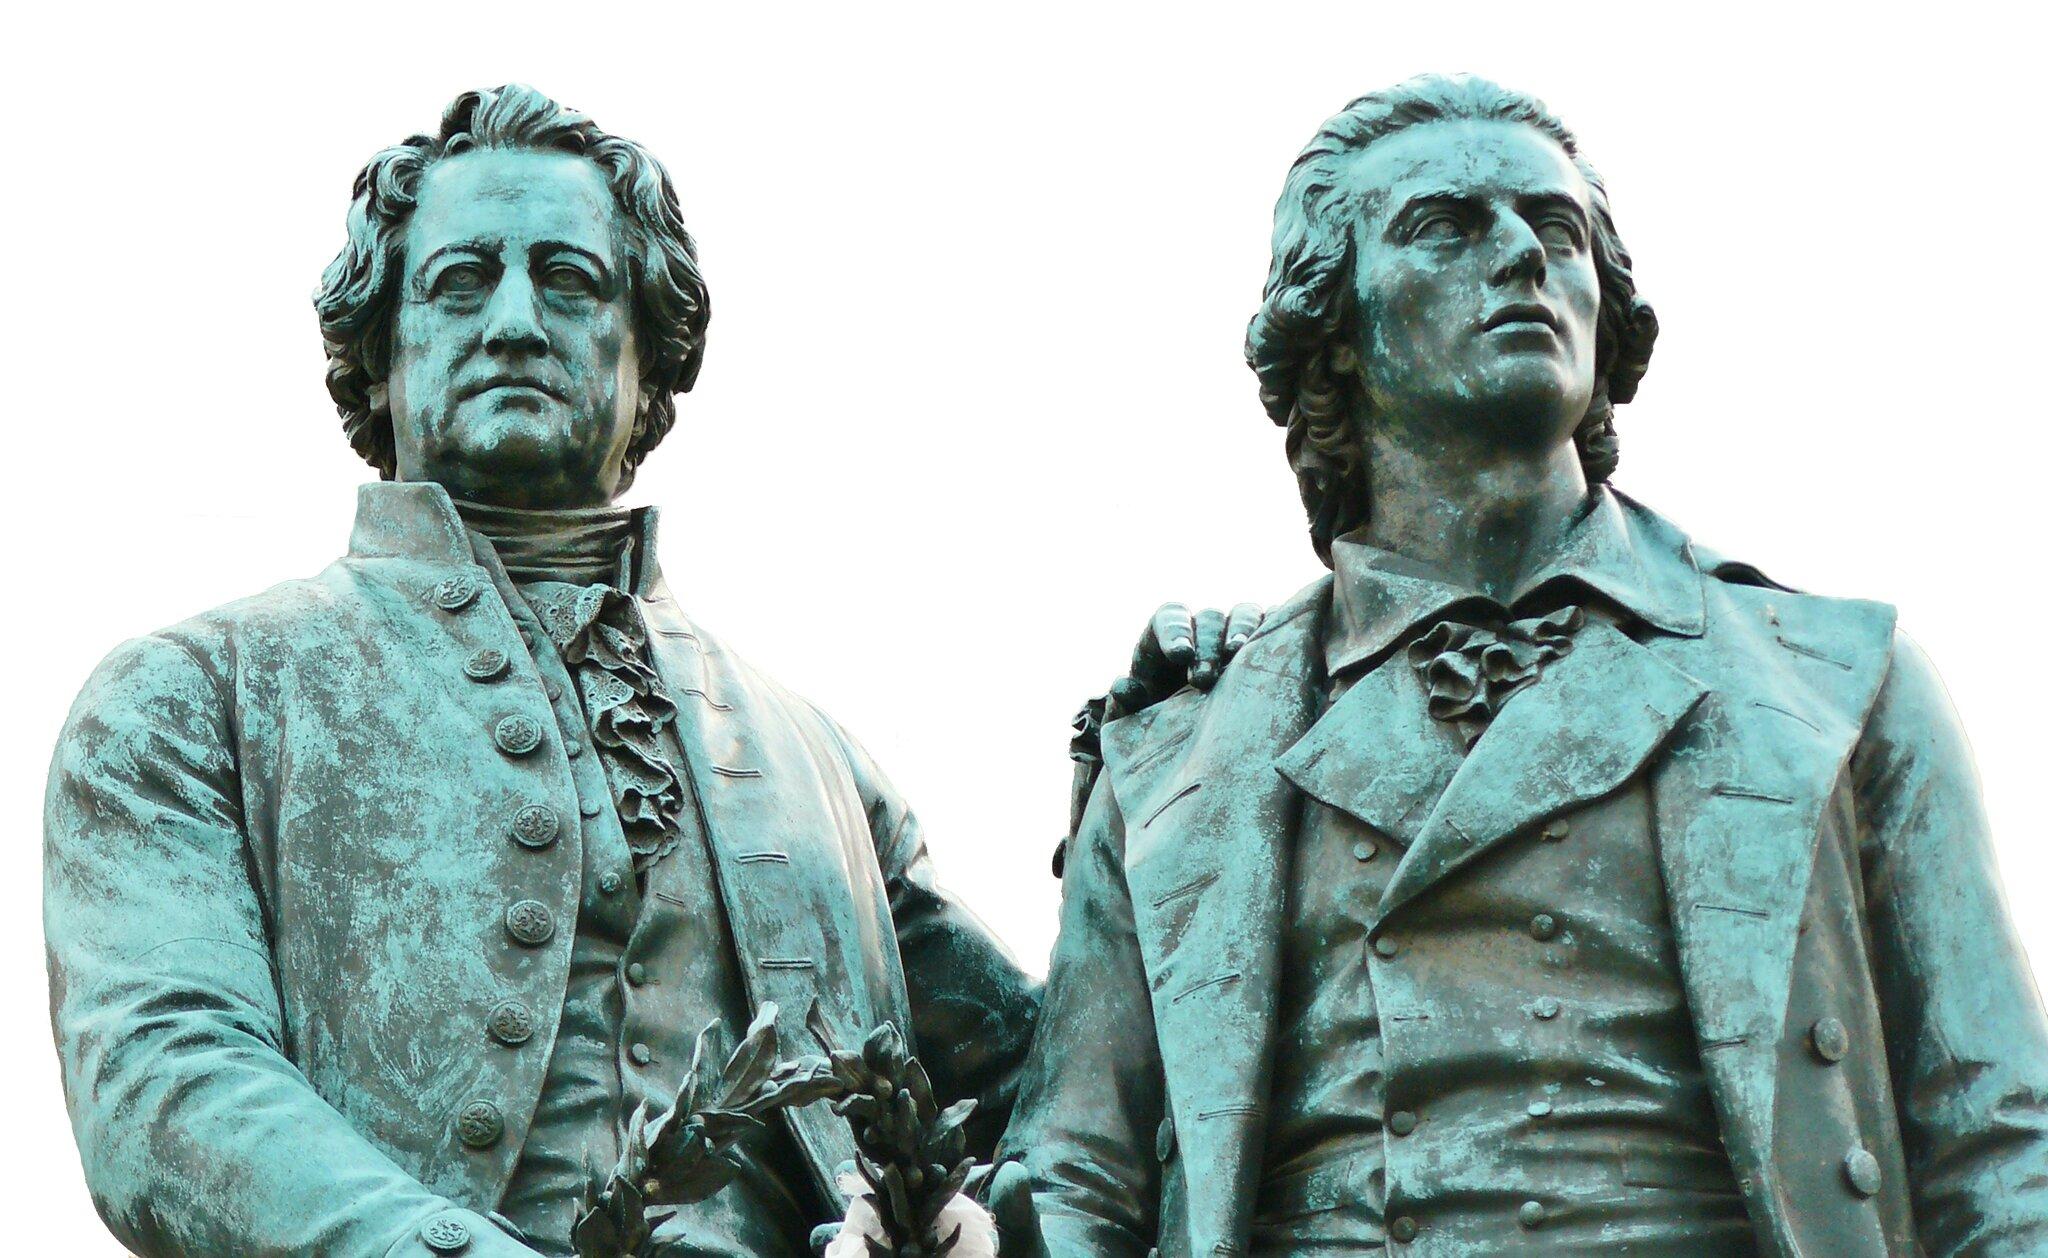 Pomnik Johanna WolfgangaGoethego iFryderyka Schillera wWeimarze Pomnik Johanna WolfgangaGoethego iFryderyka Schillera wWeimarze Źródło: domena publiczna.